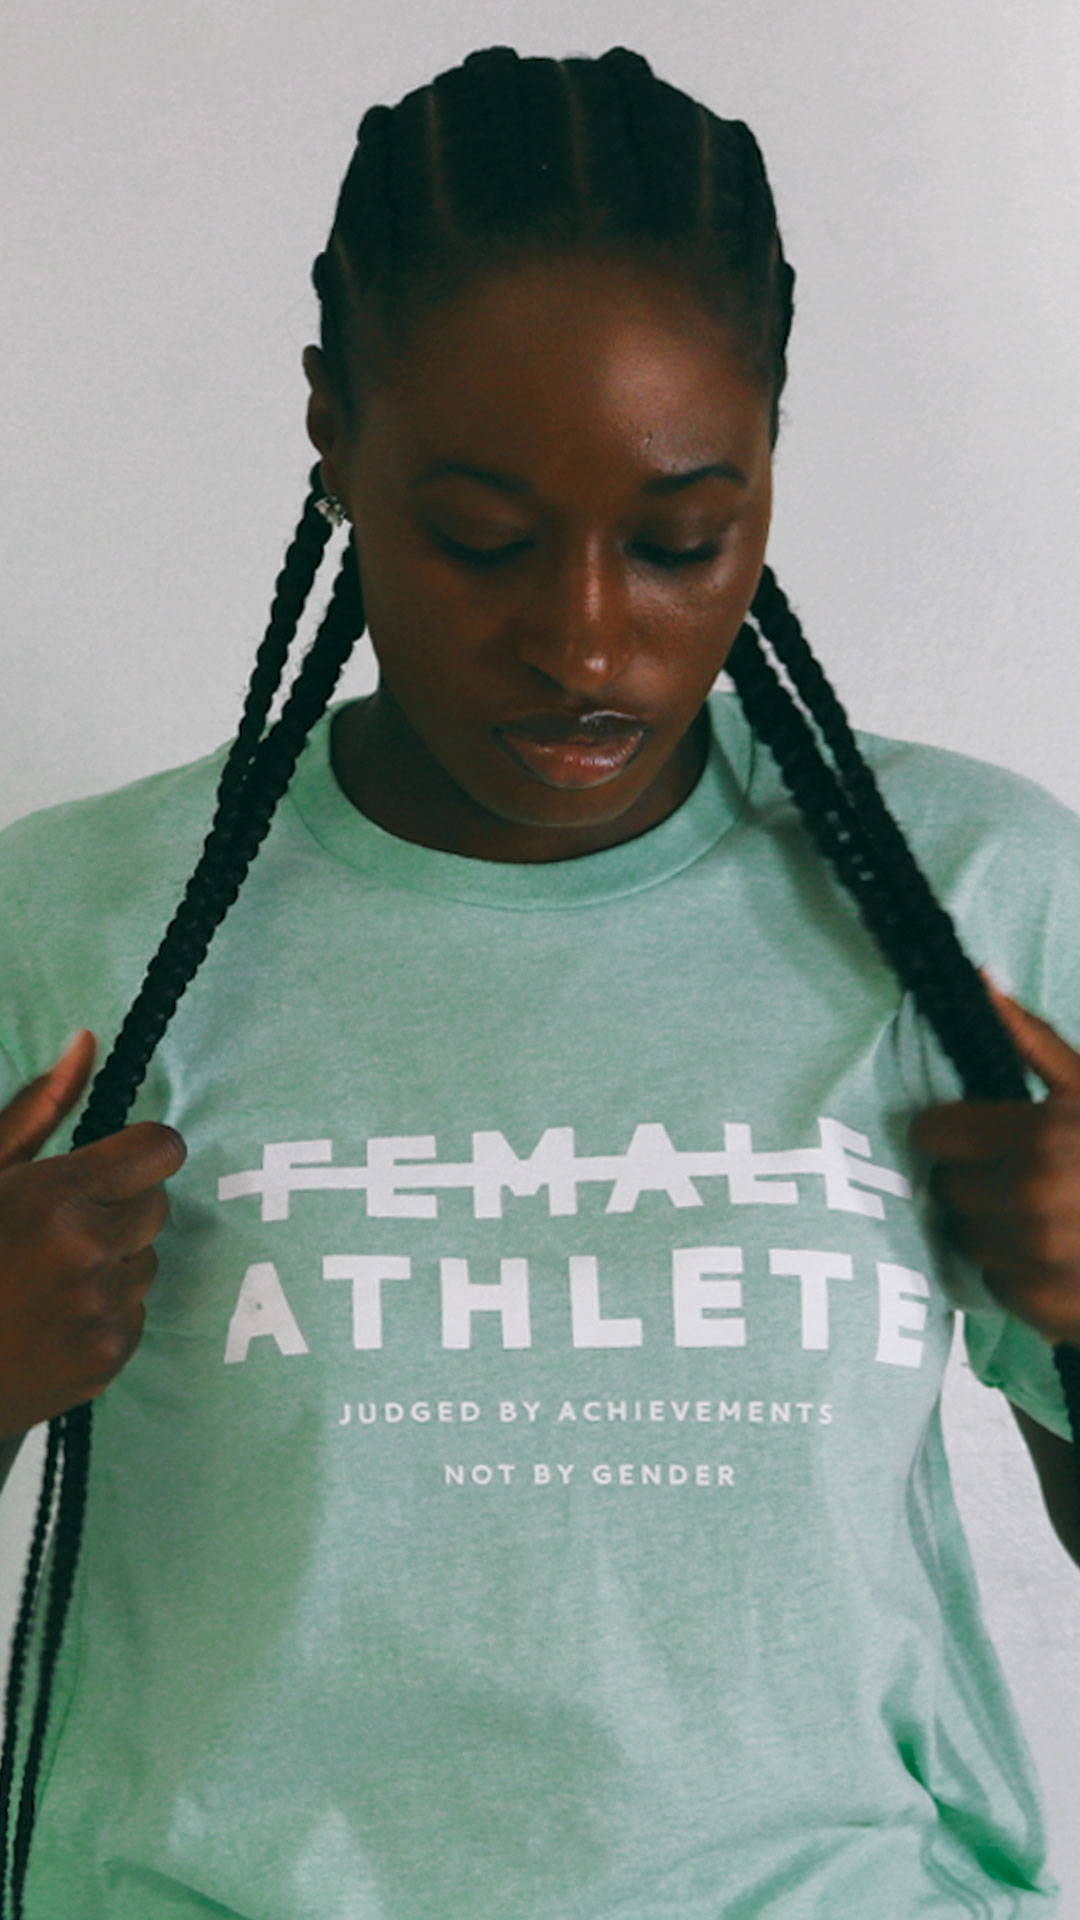 Female Athlete T-shirt